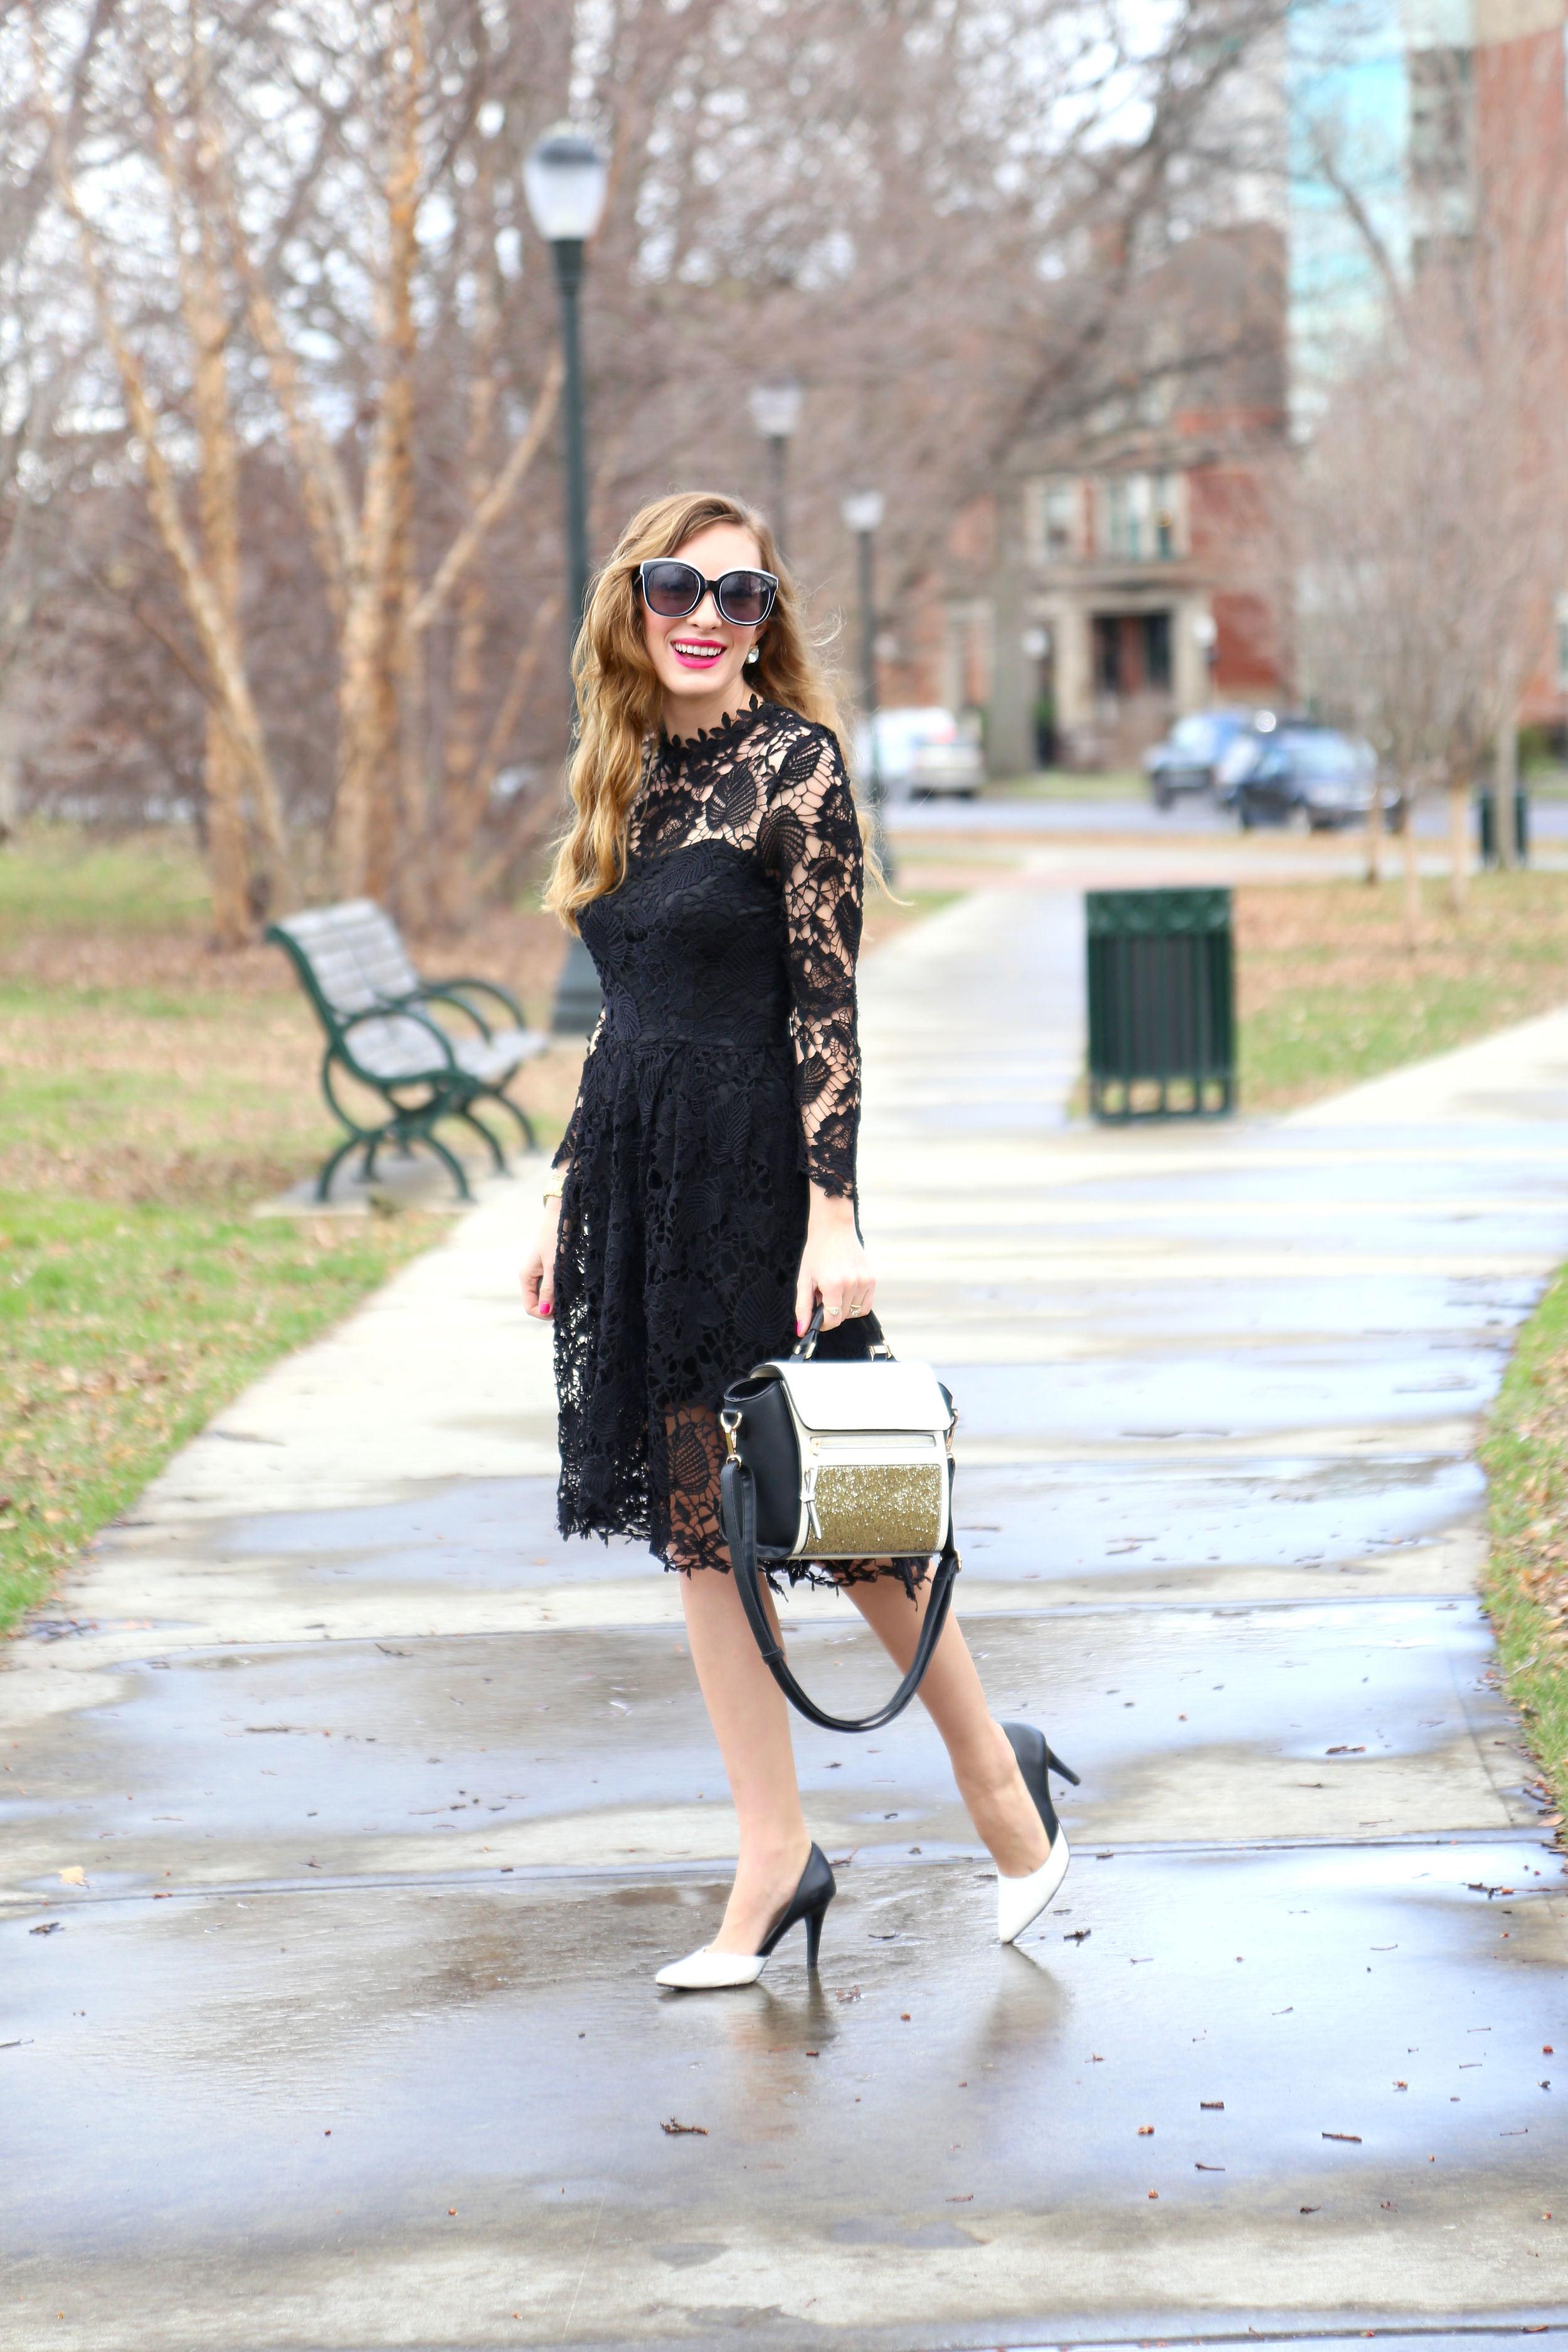 Black Lace Dress- Enchanting Elegance